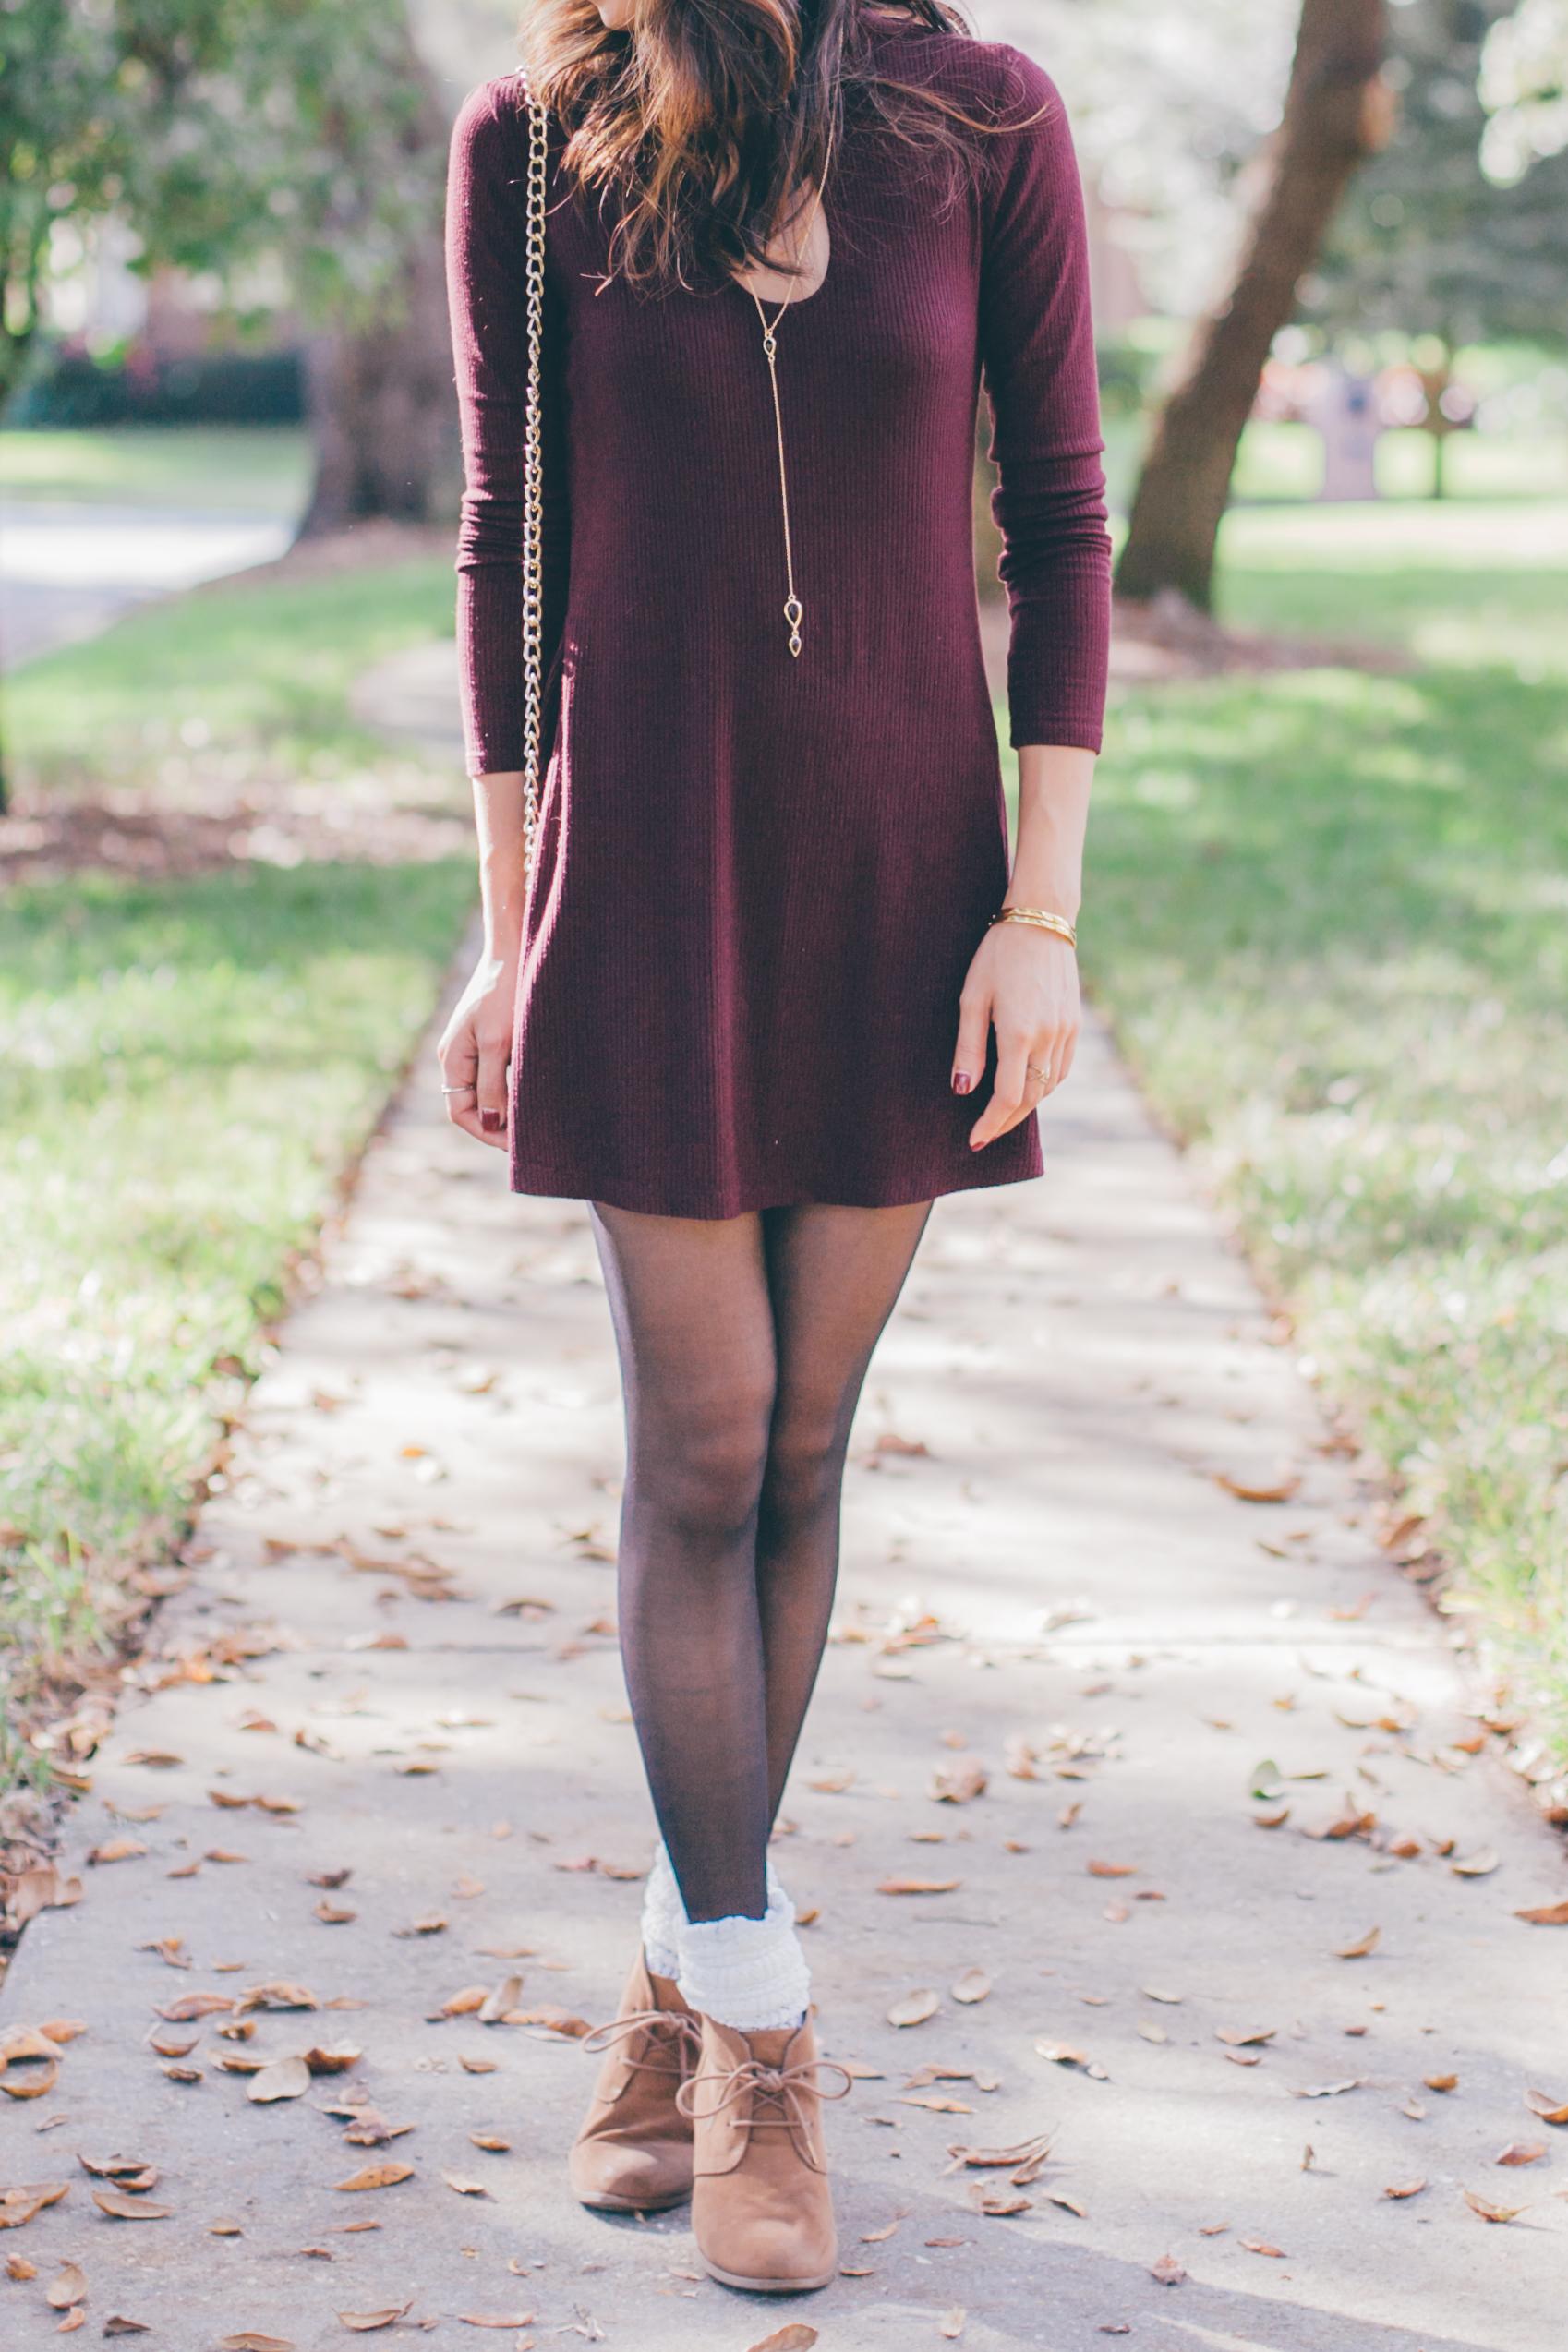 This Jenn Girl - Keyhole Dress 3